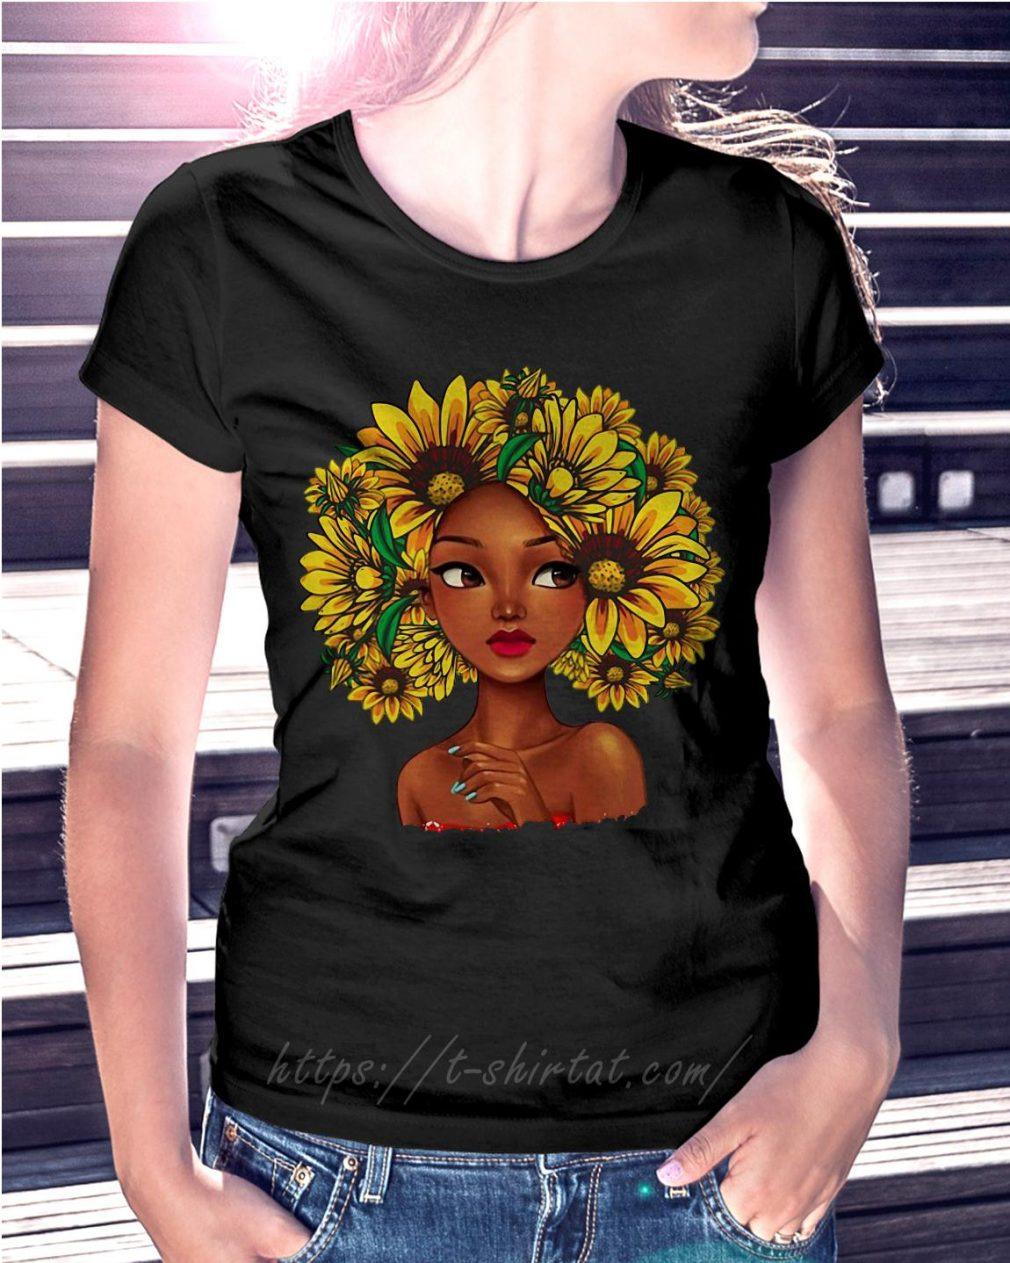 Black girl with sunflowers natural hair Ladies Tee